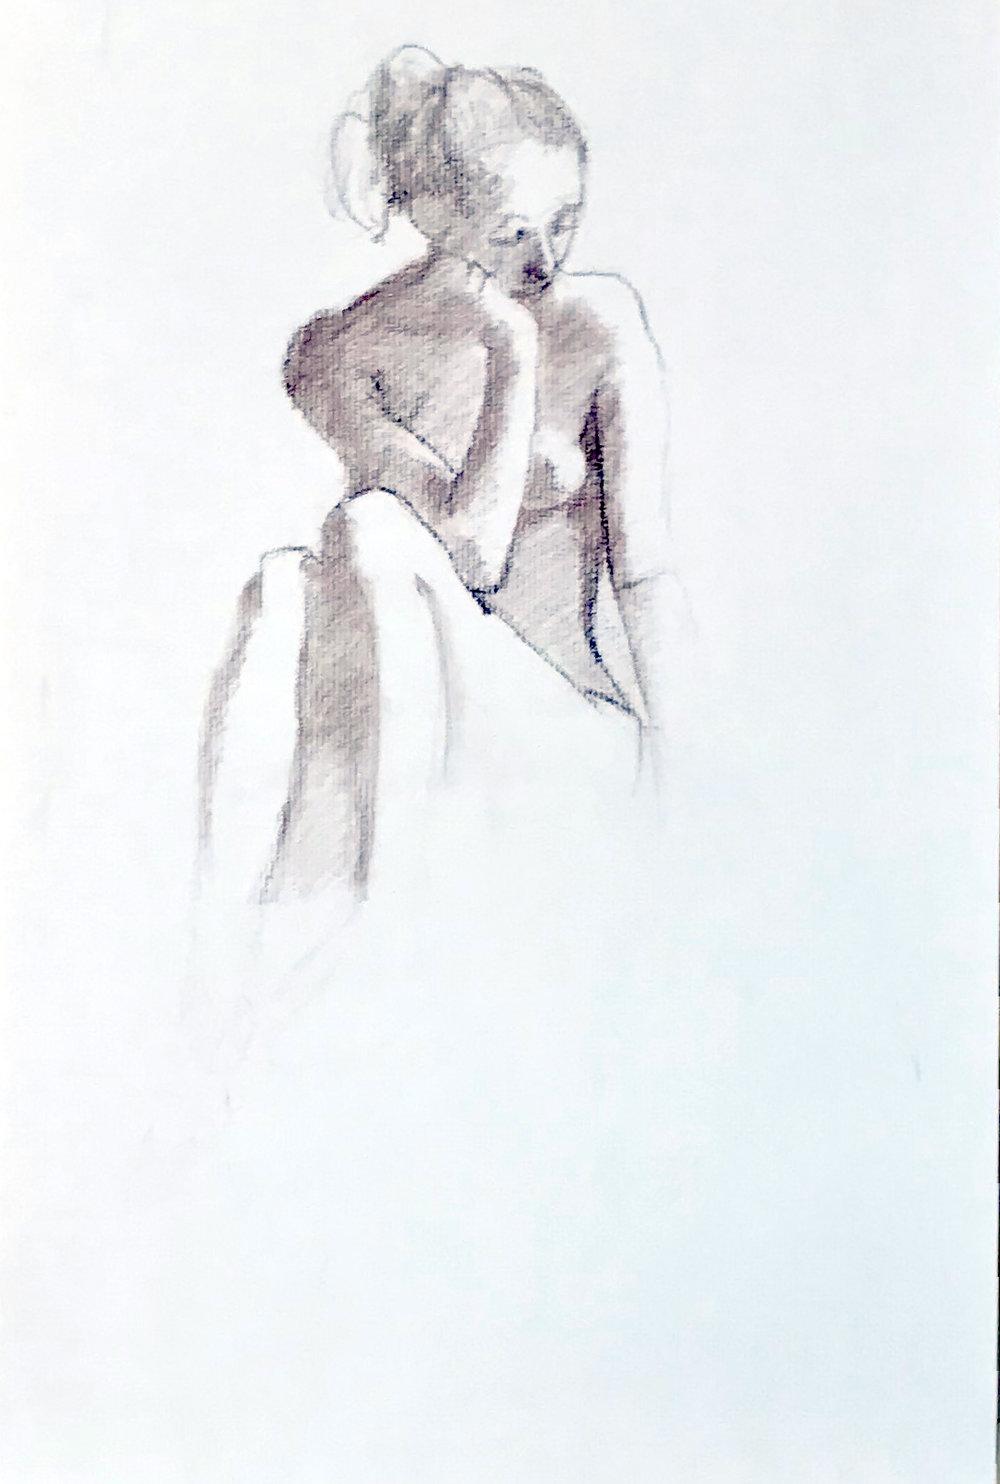 Sketch, Untitled